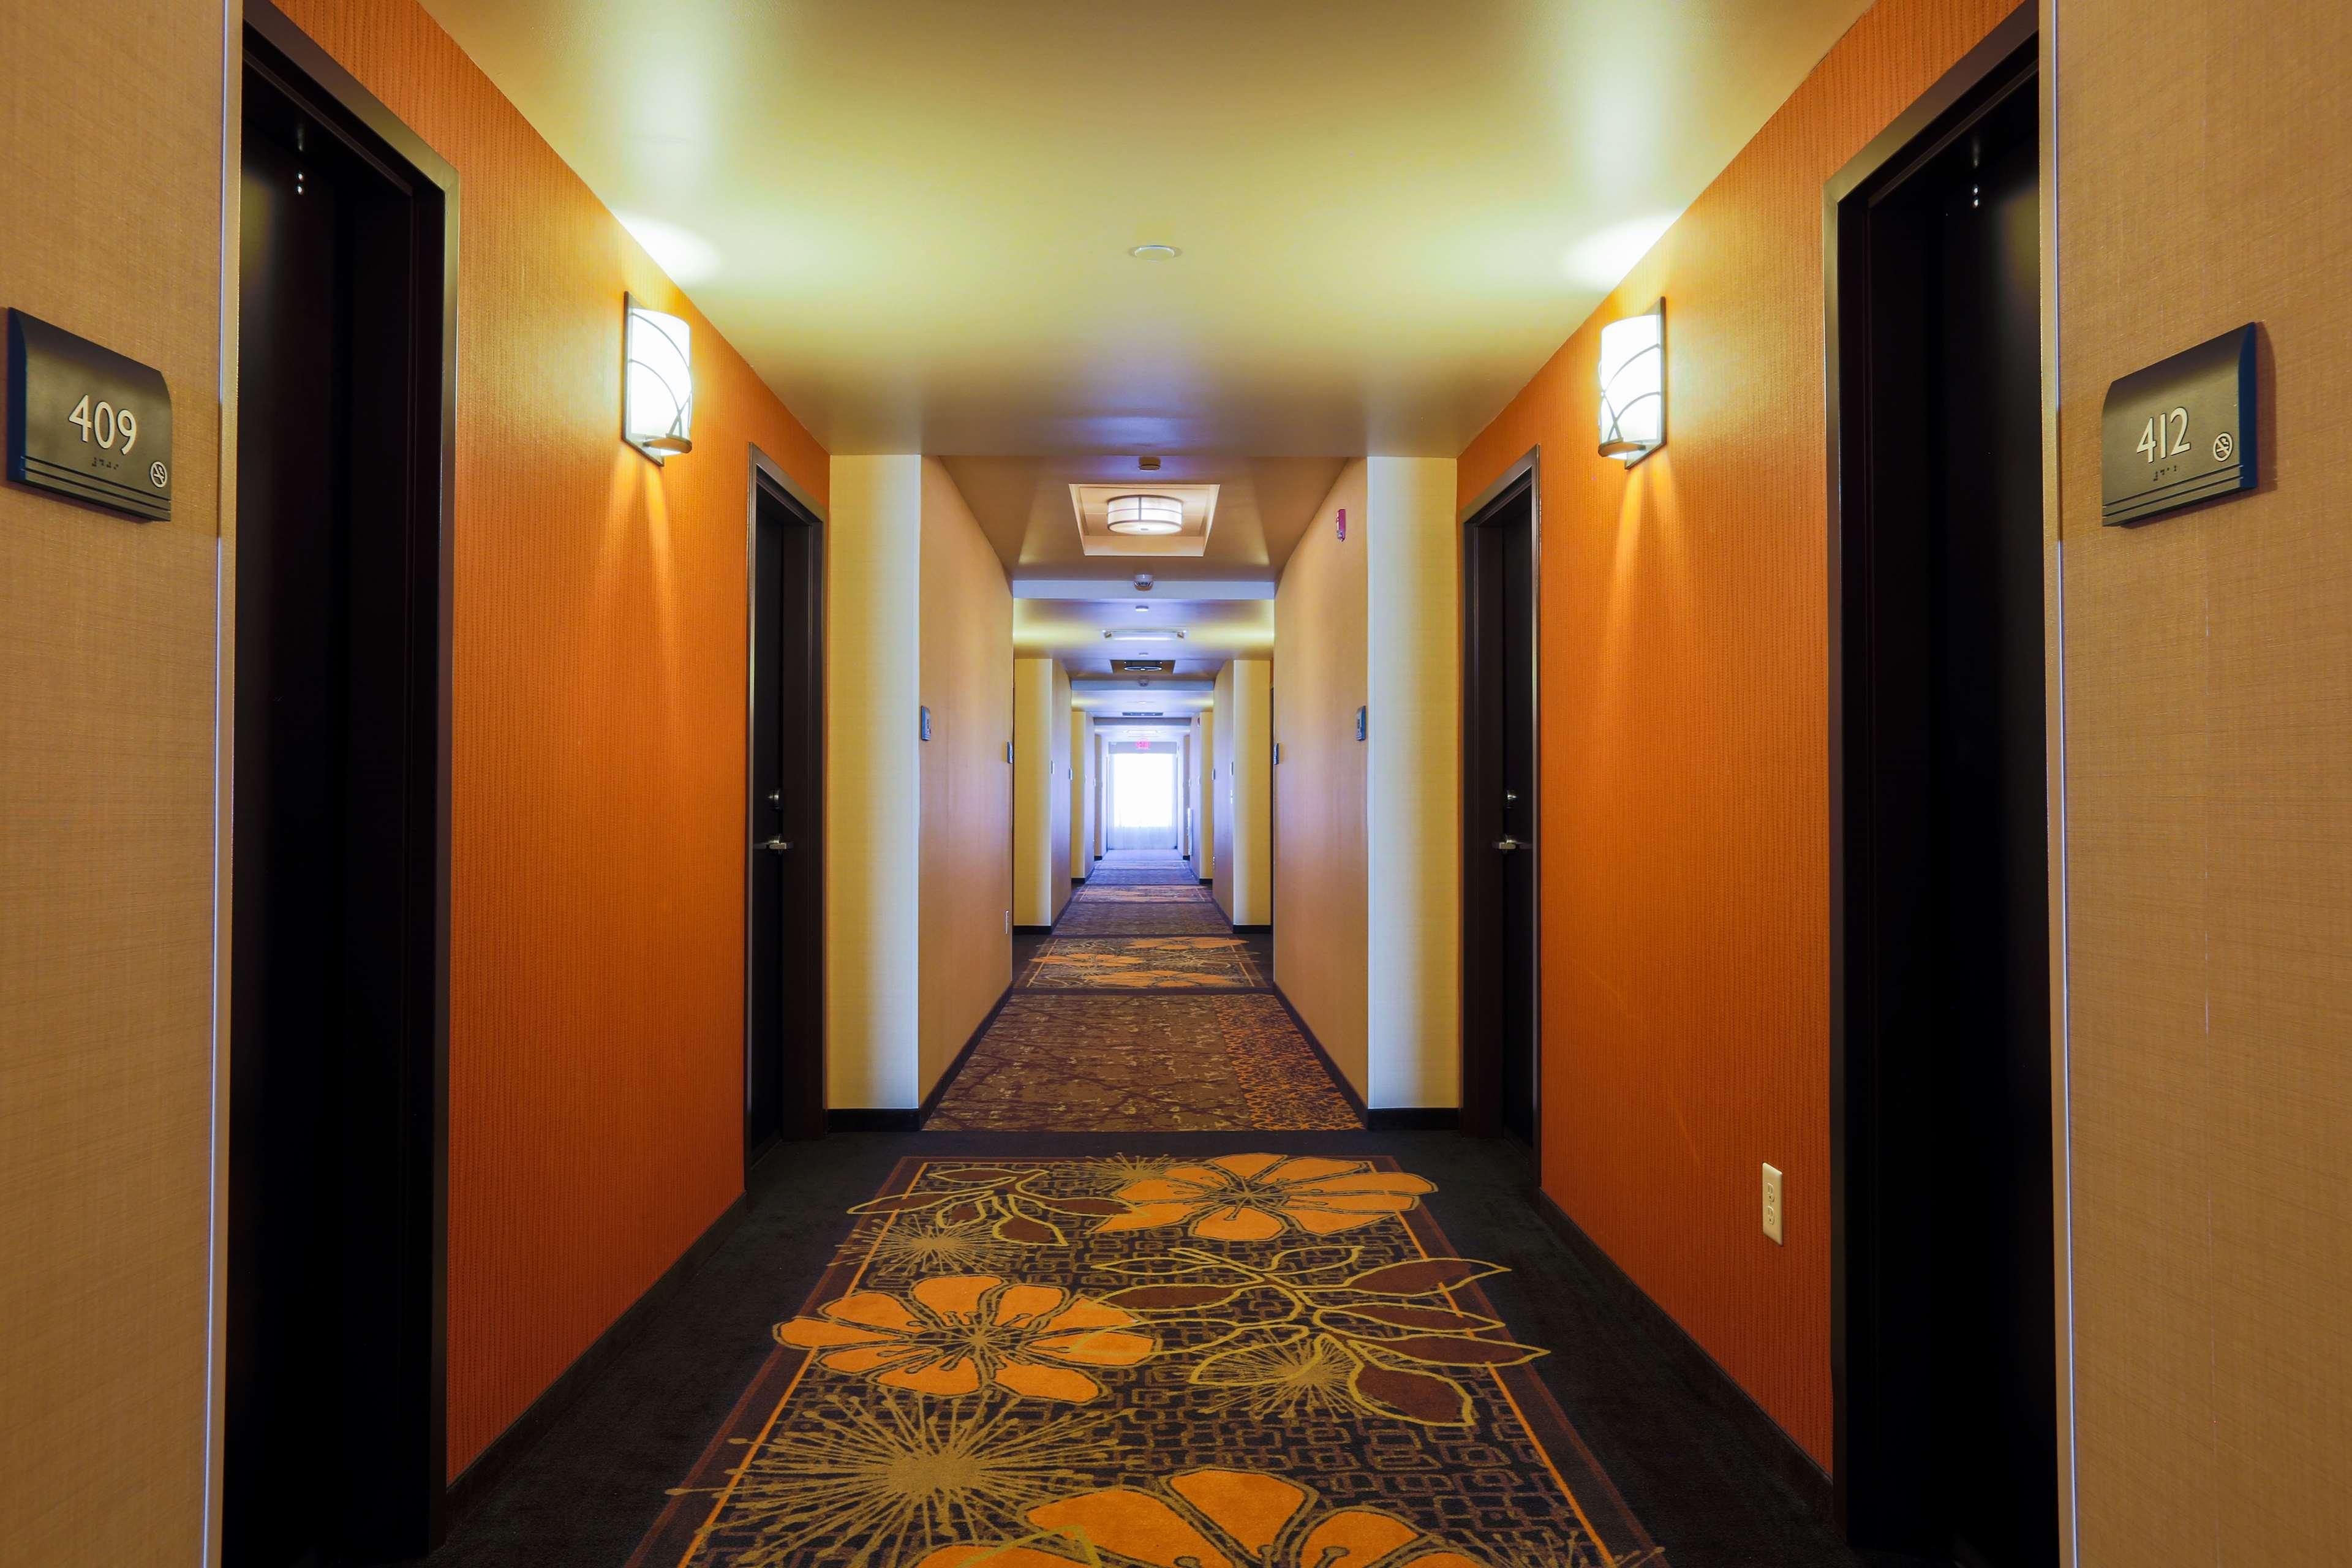 Hilton Garden Inn Indiana at IUP image 1